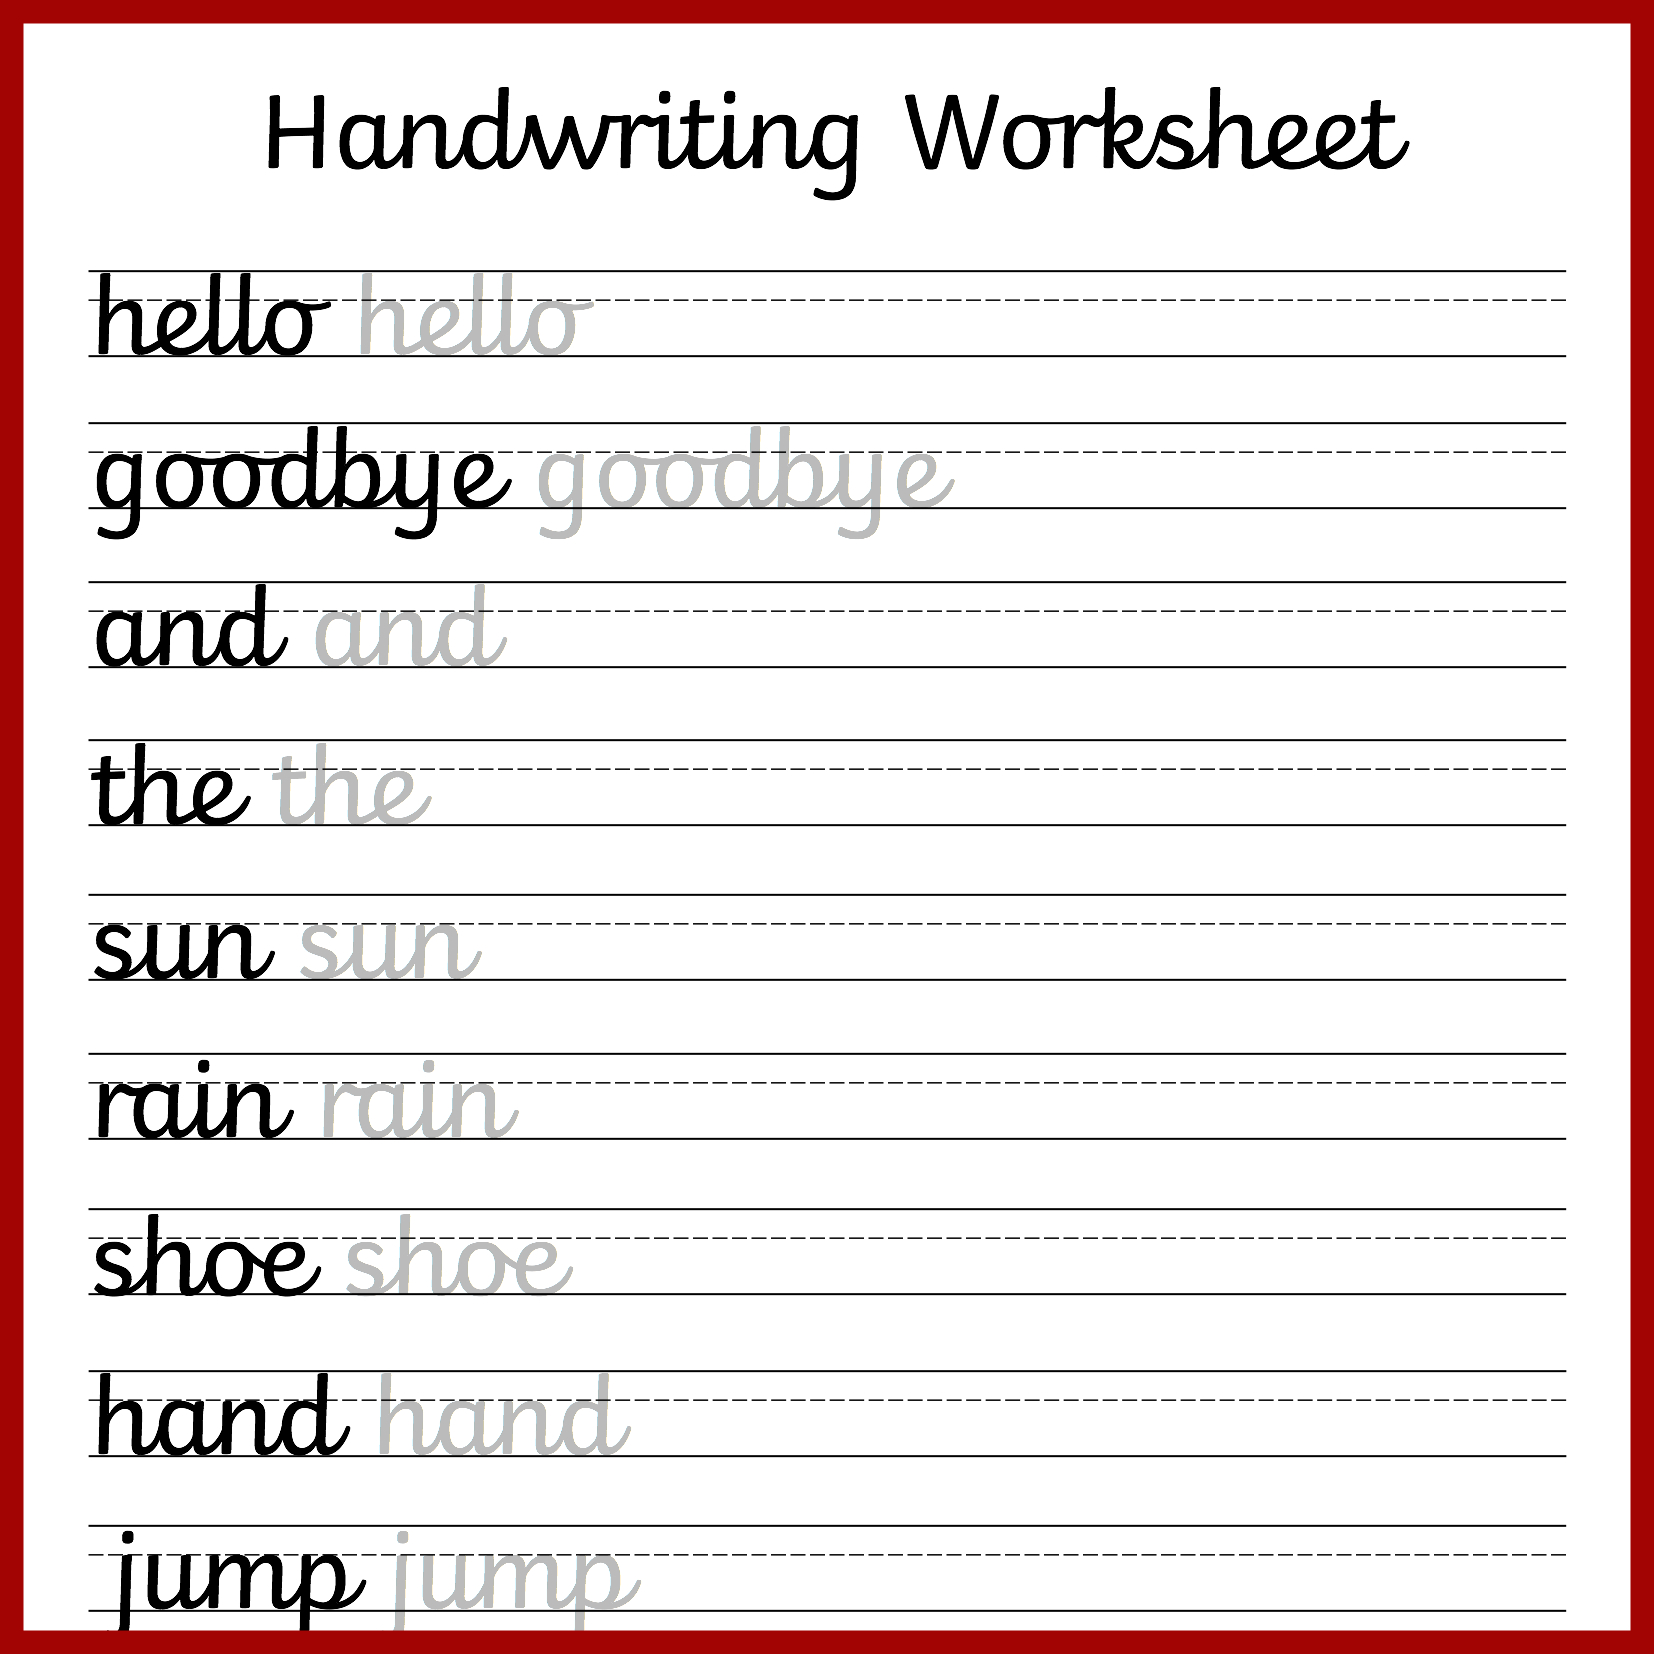 Cursive Handwriting Worksheets – Free Printable! ⋆ Mama Geek - Free Printable Worksheets Uk